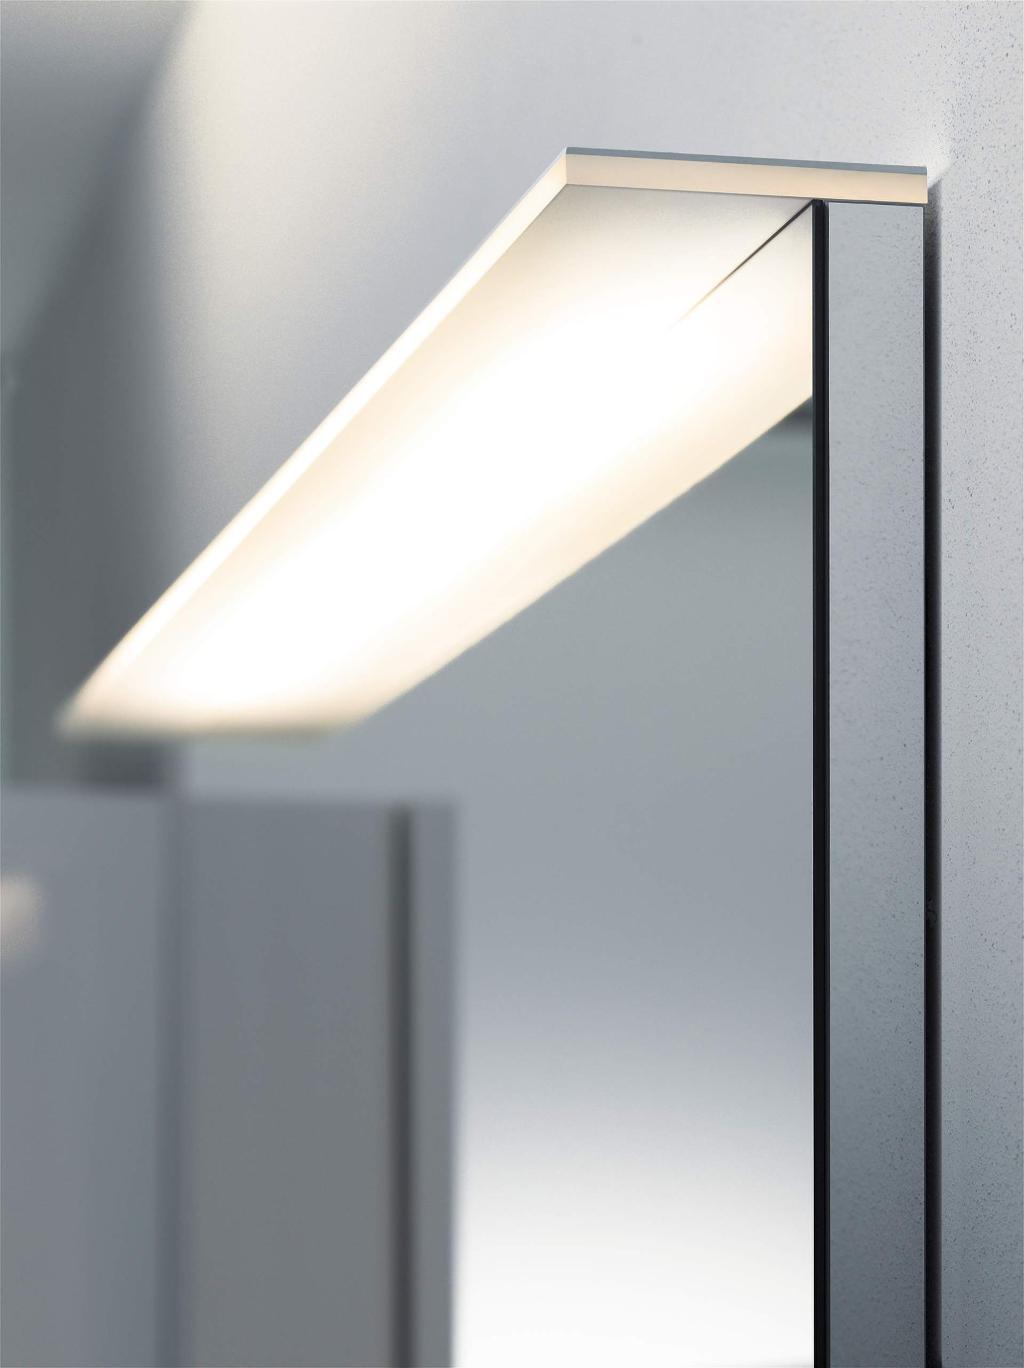 Duravit Delos: Bathroom furniture designed by EOOS | Duravit